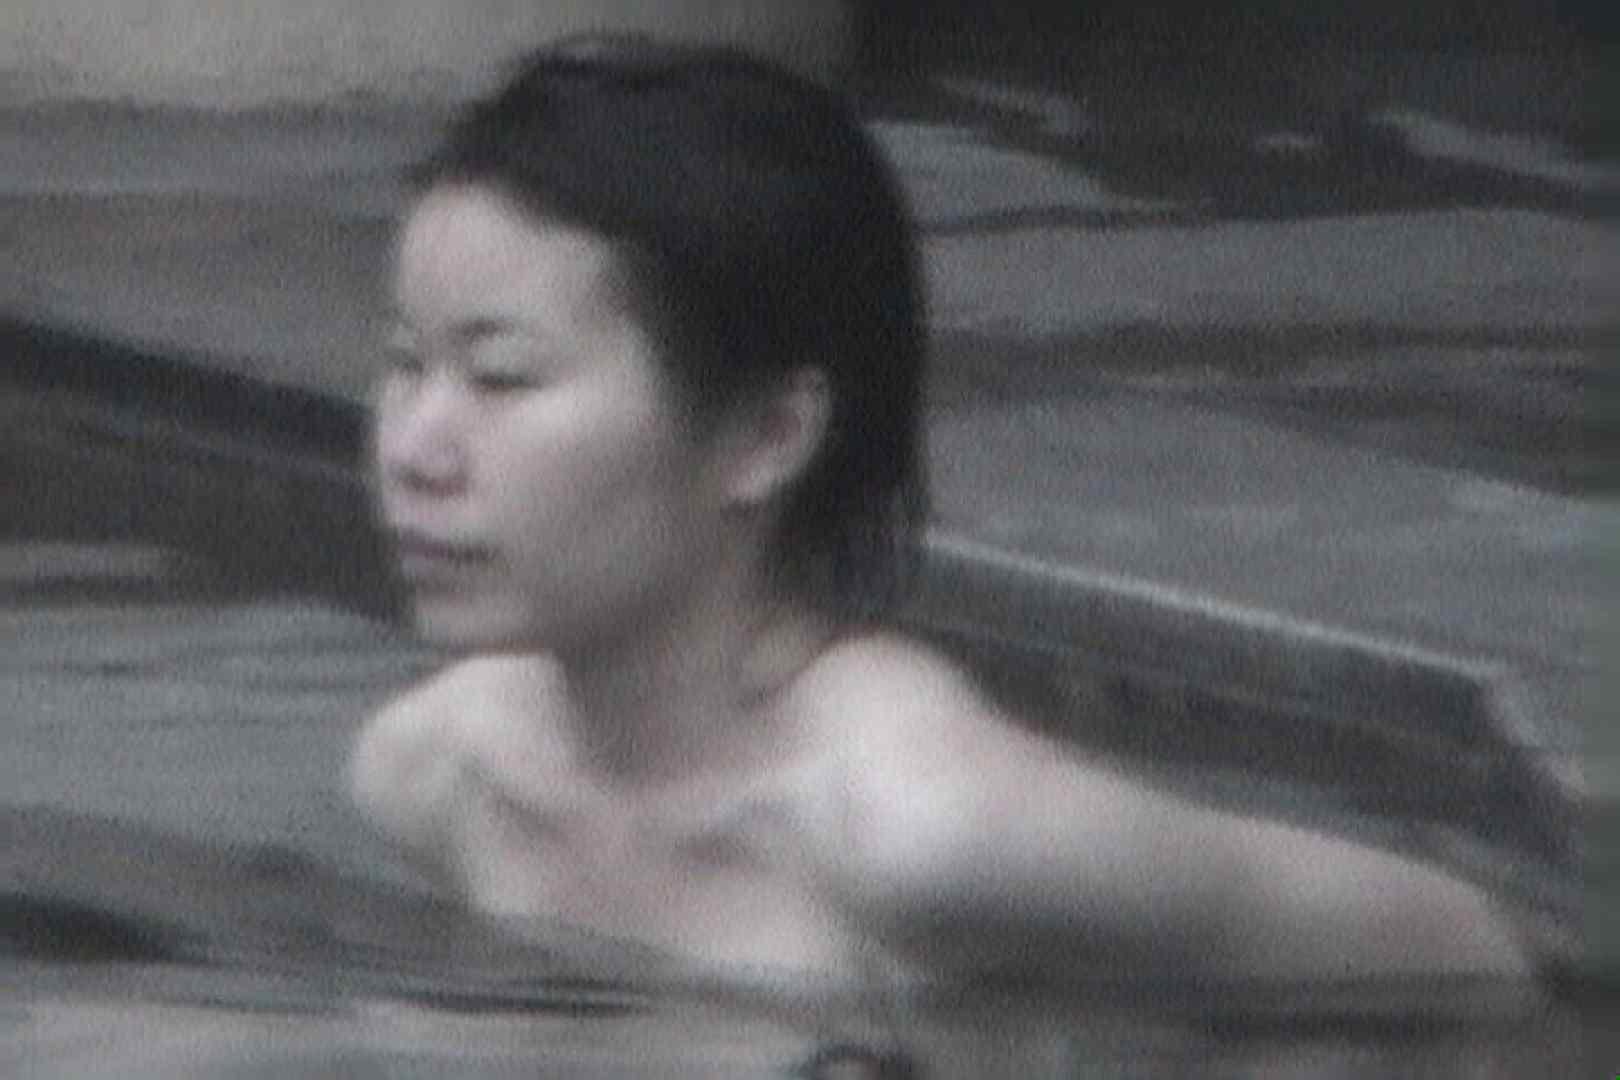 Aquaな露天風呂Vol.556 露天風呂突入 | 盗撮師作品  69pic 55